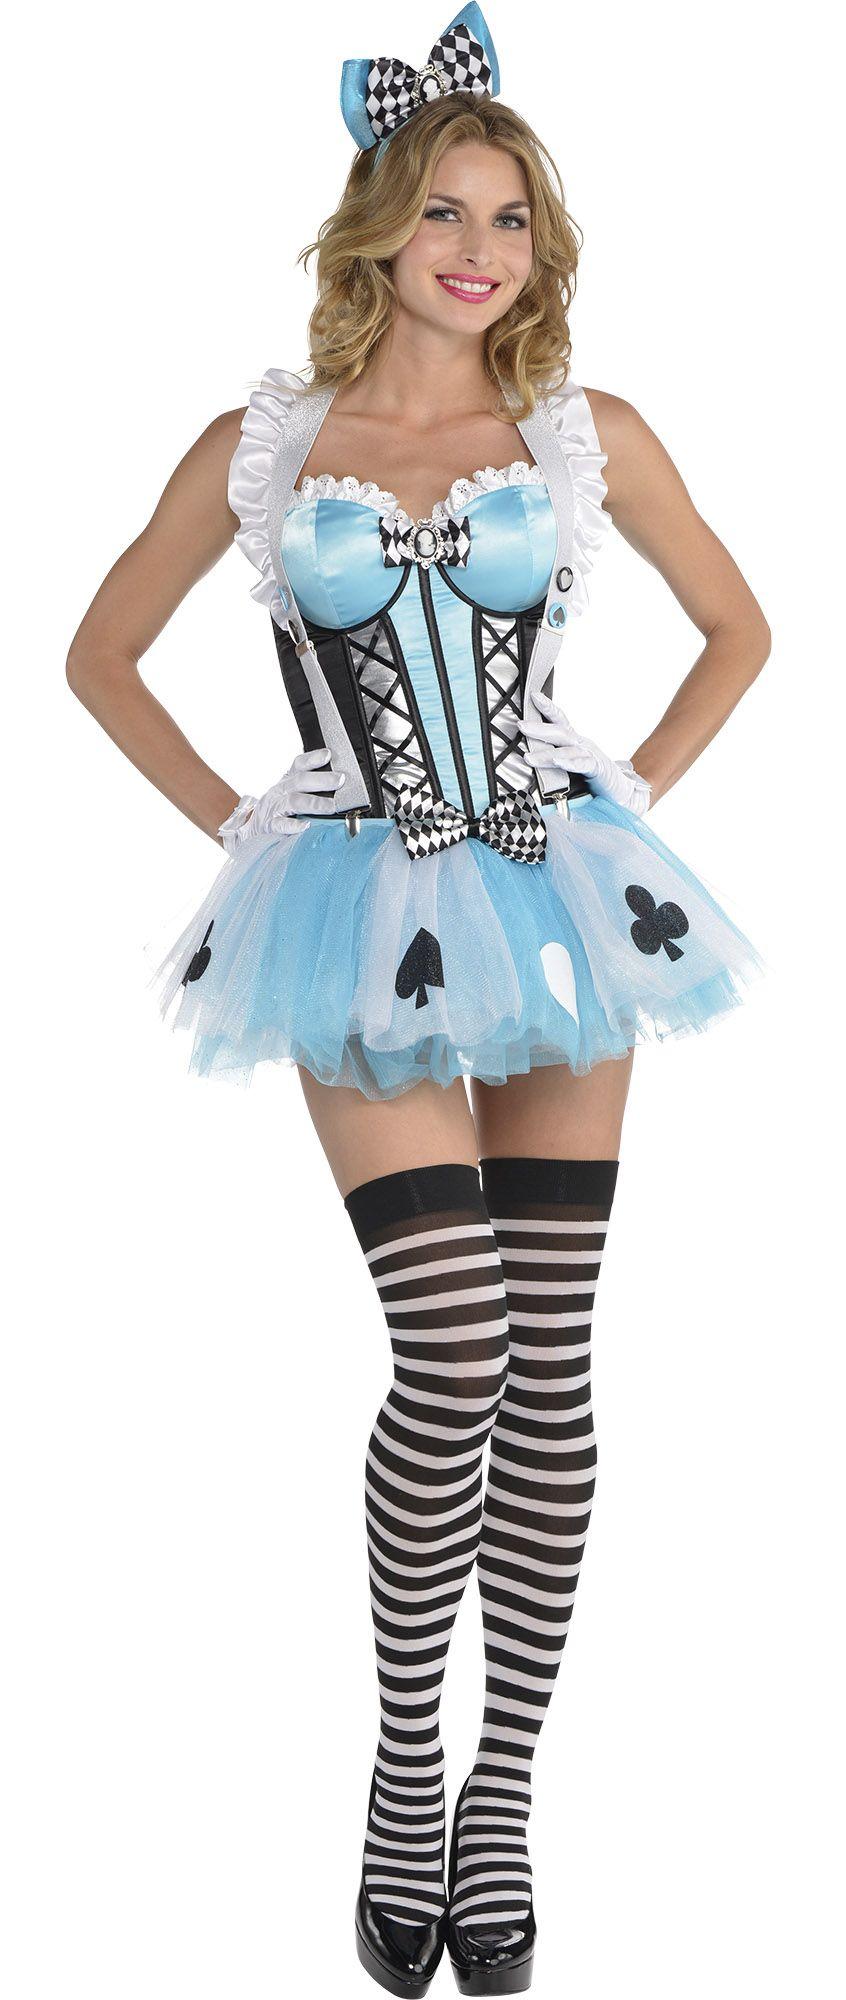 Create Your Own Look - Female Alice in Wonderland #2